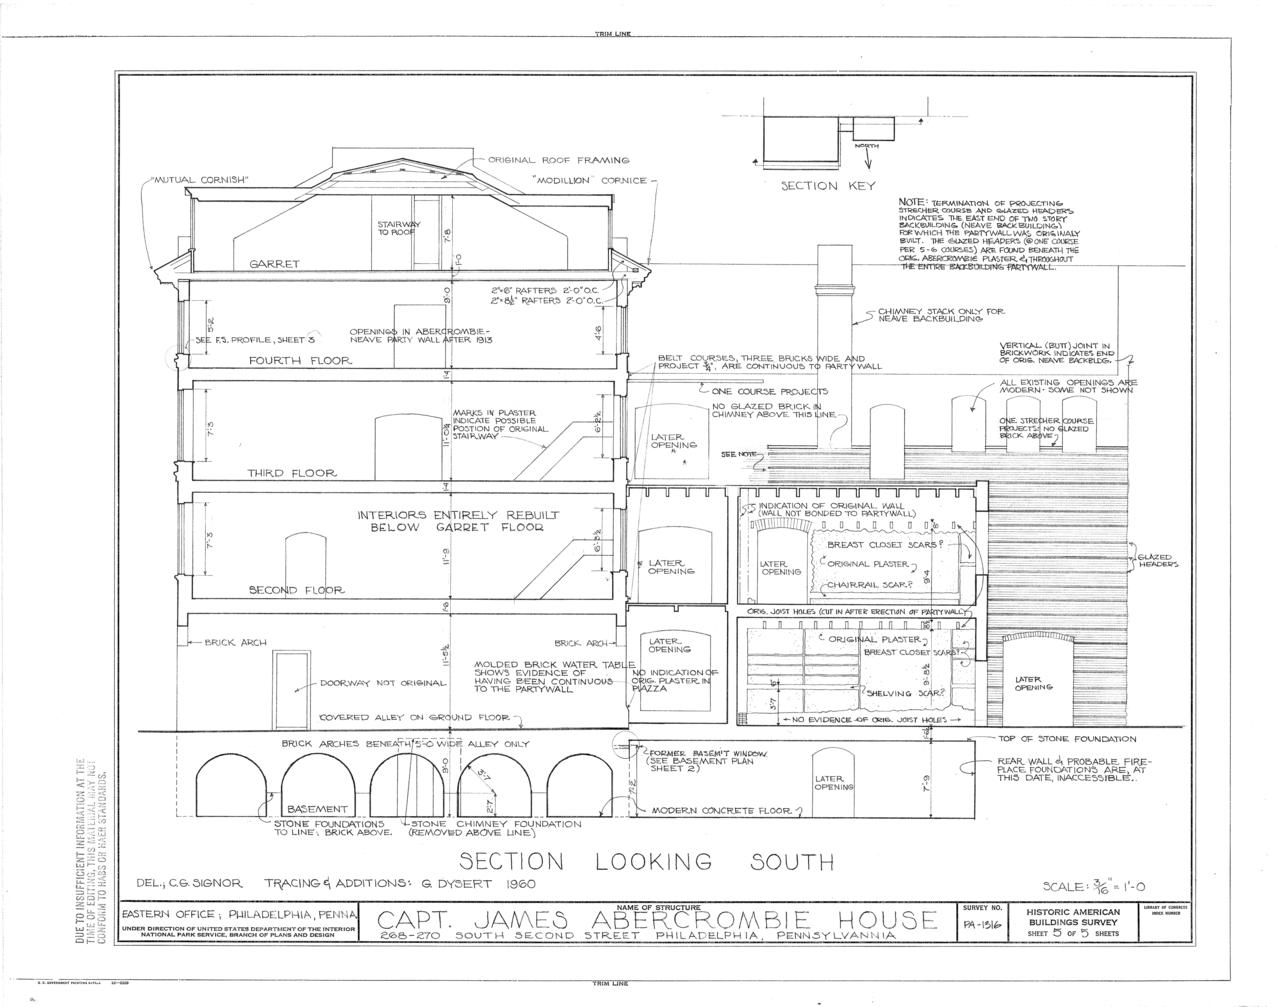 File:Captain James Abercrombie House, 268-270 South Second Street ...